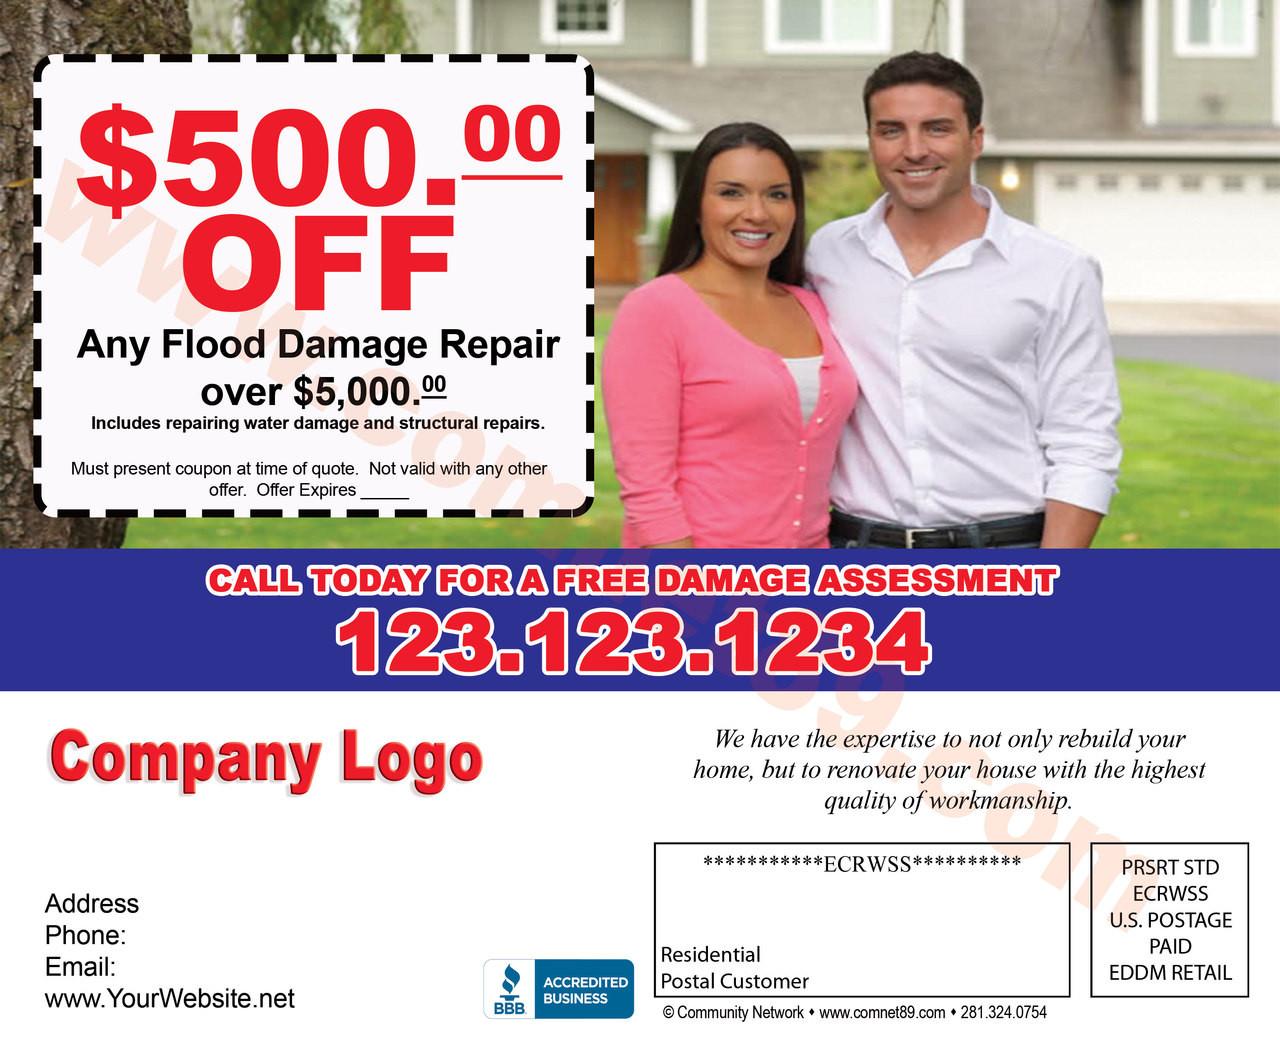 Flood Damage 03 EDDM Postcard